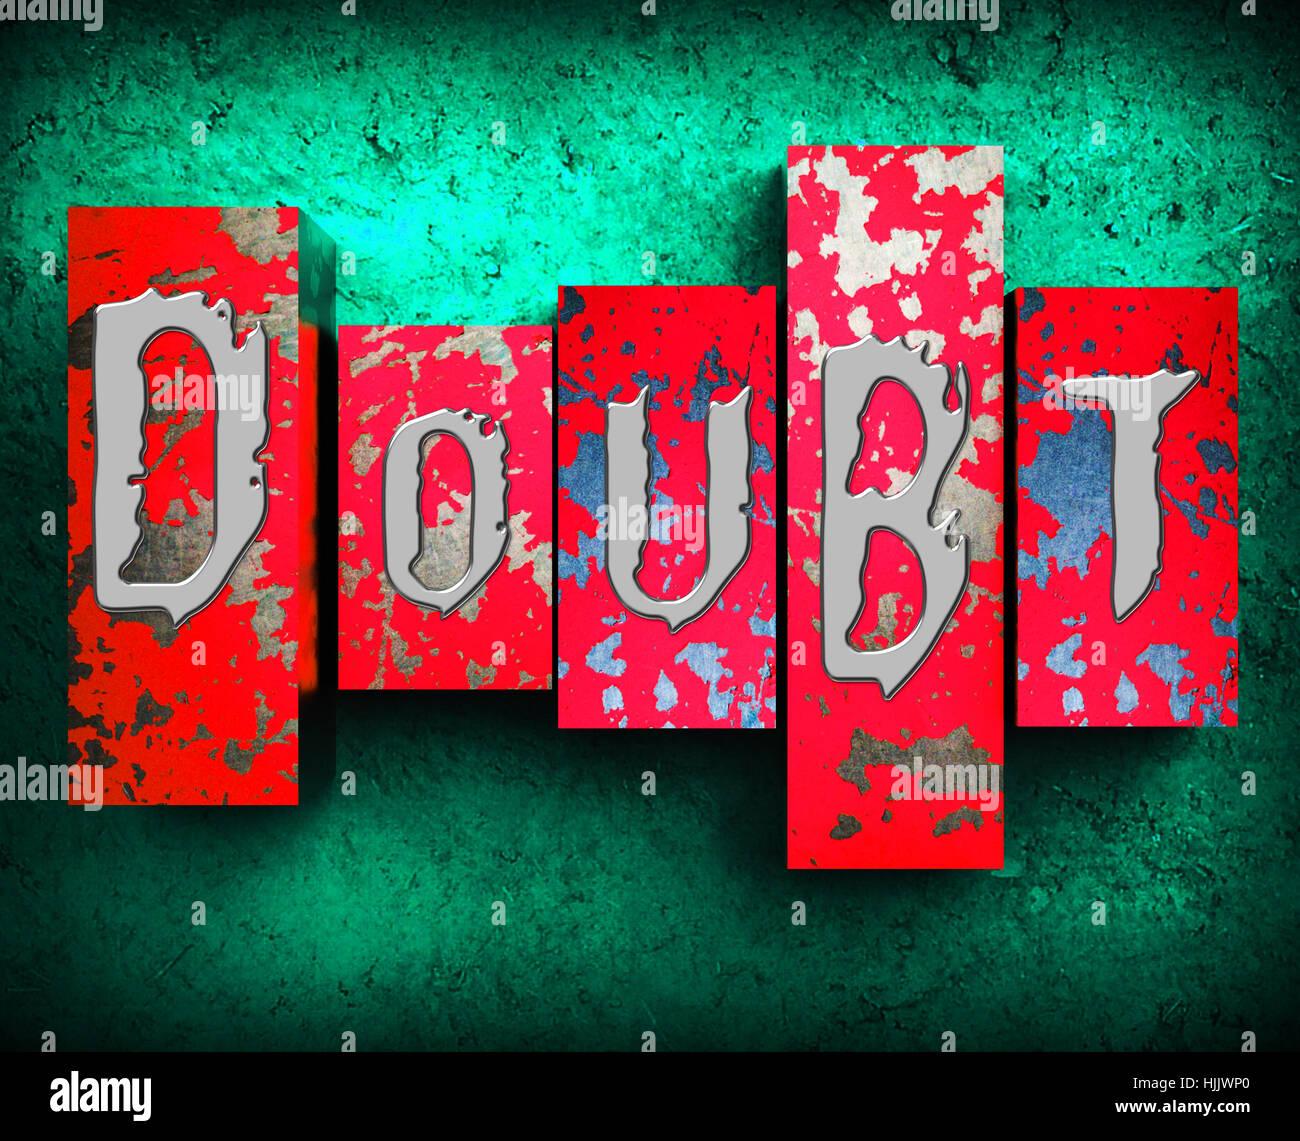 Doubt Word Showing Melancholy Fatalistic 3d Illustration - Stock Image